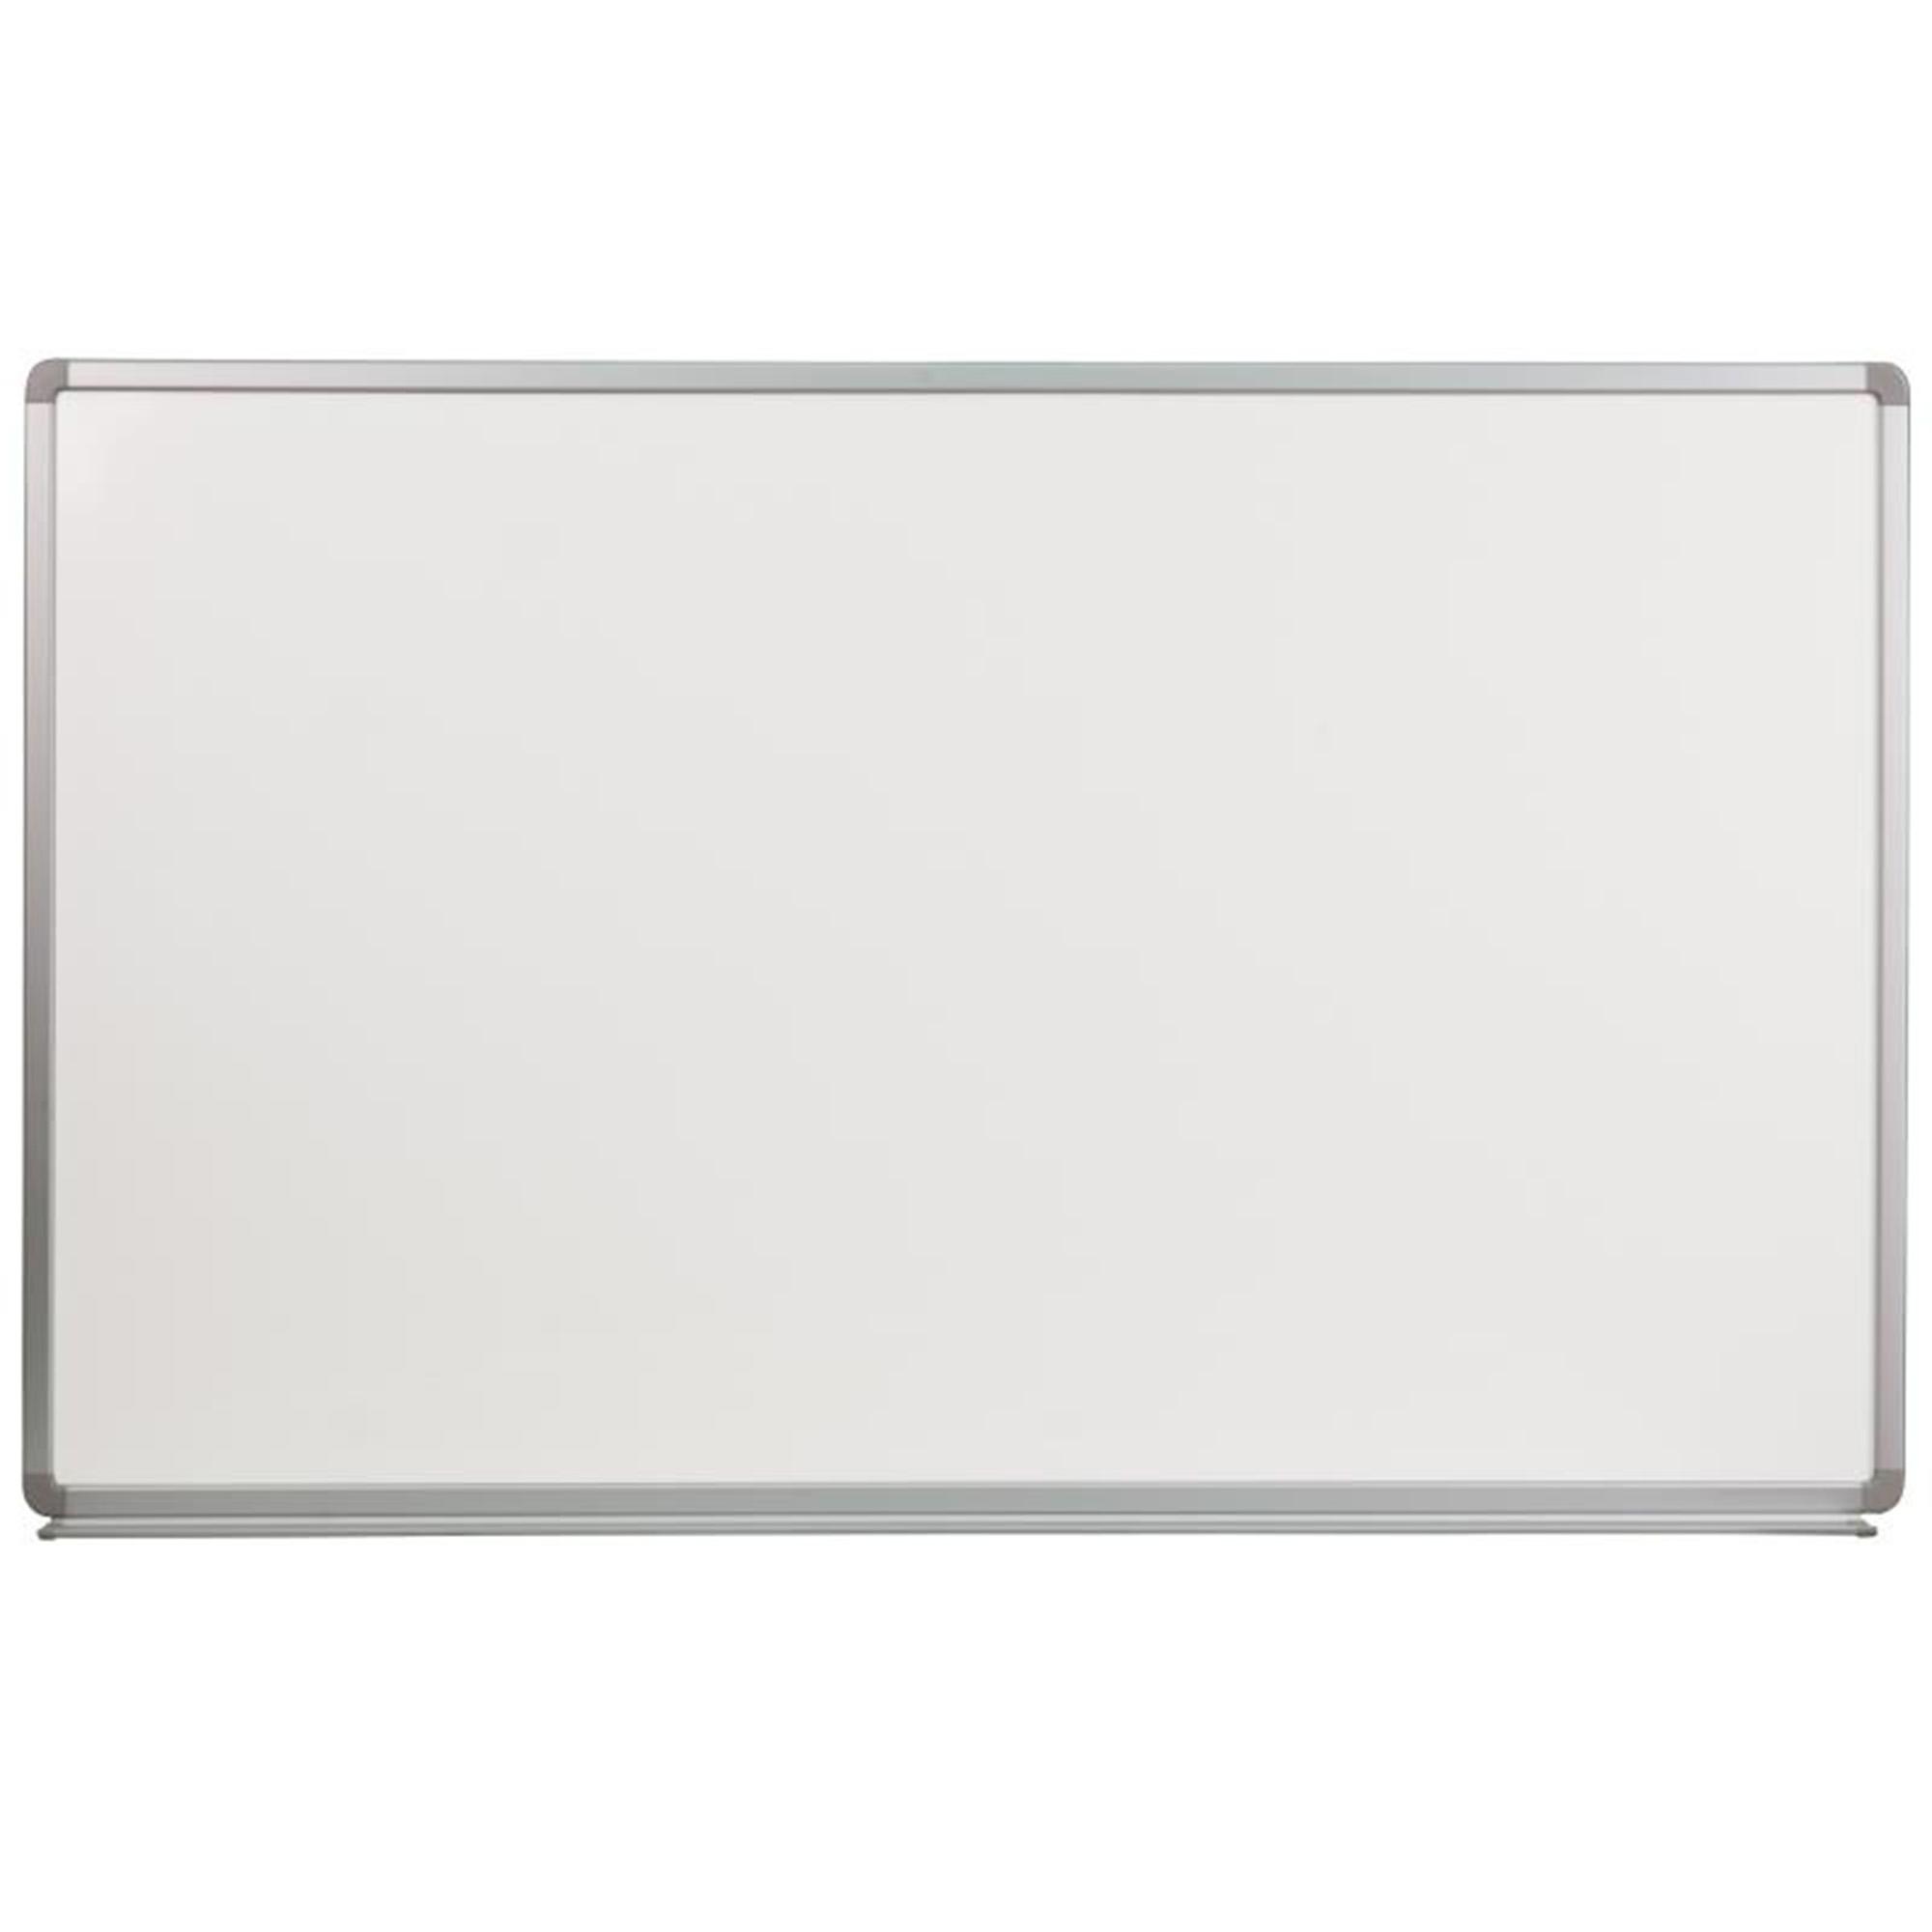 Offex 5' W x 3' H Porcelain Magnetic Marker Board YU-90X150-POR-GG